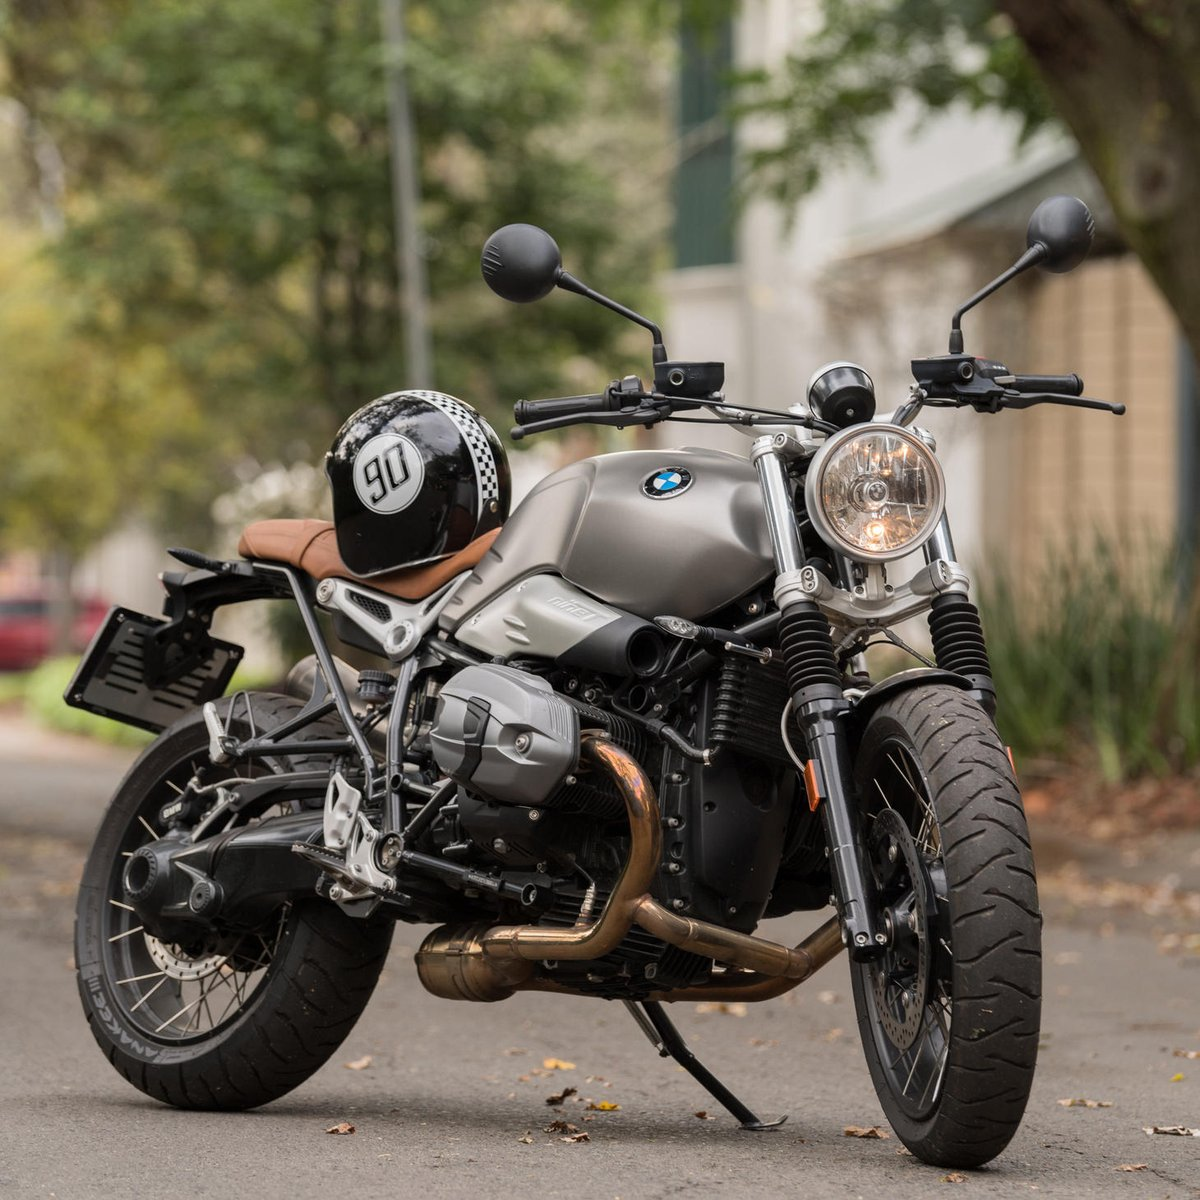 BMW Motorrad on Twitter: